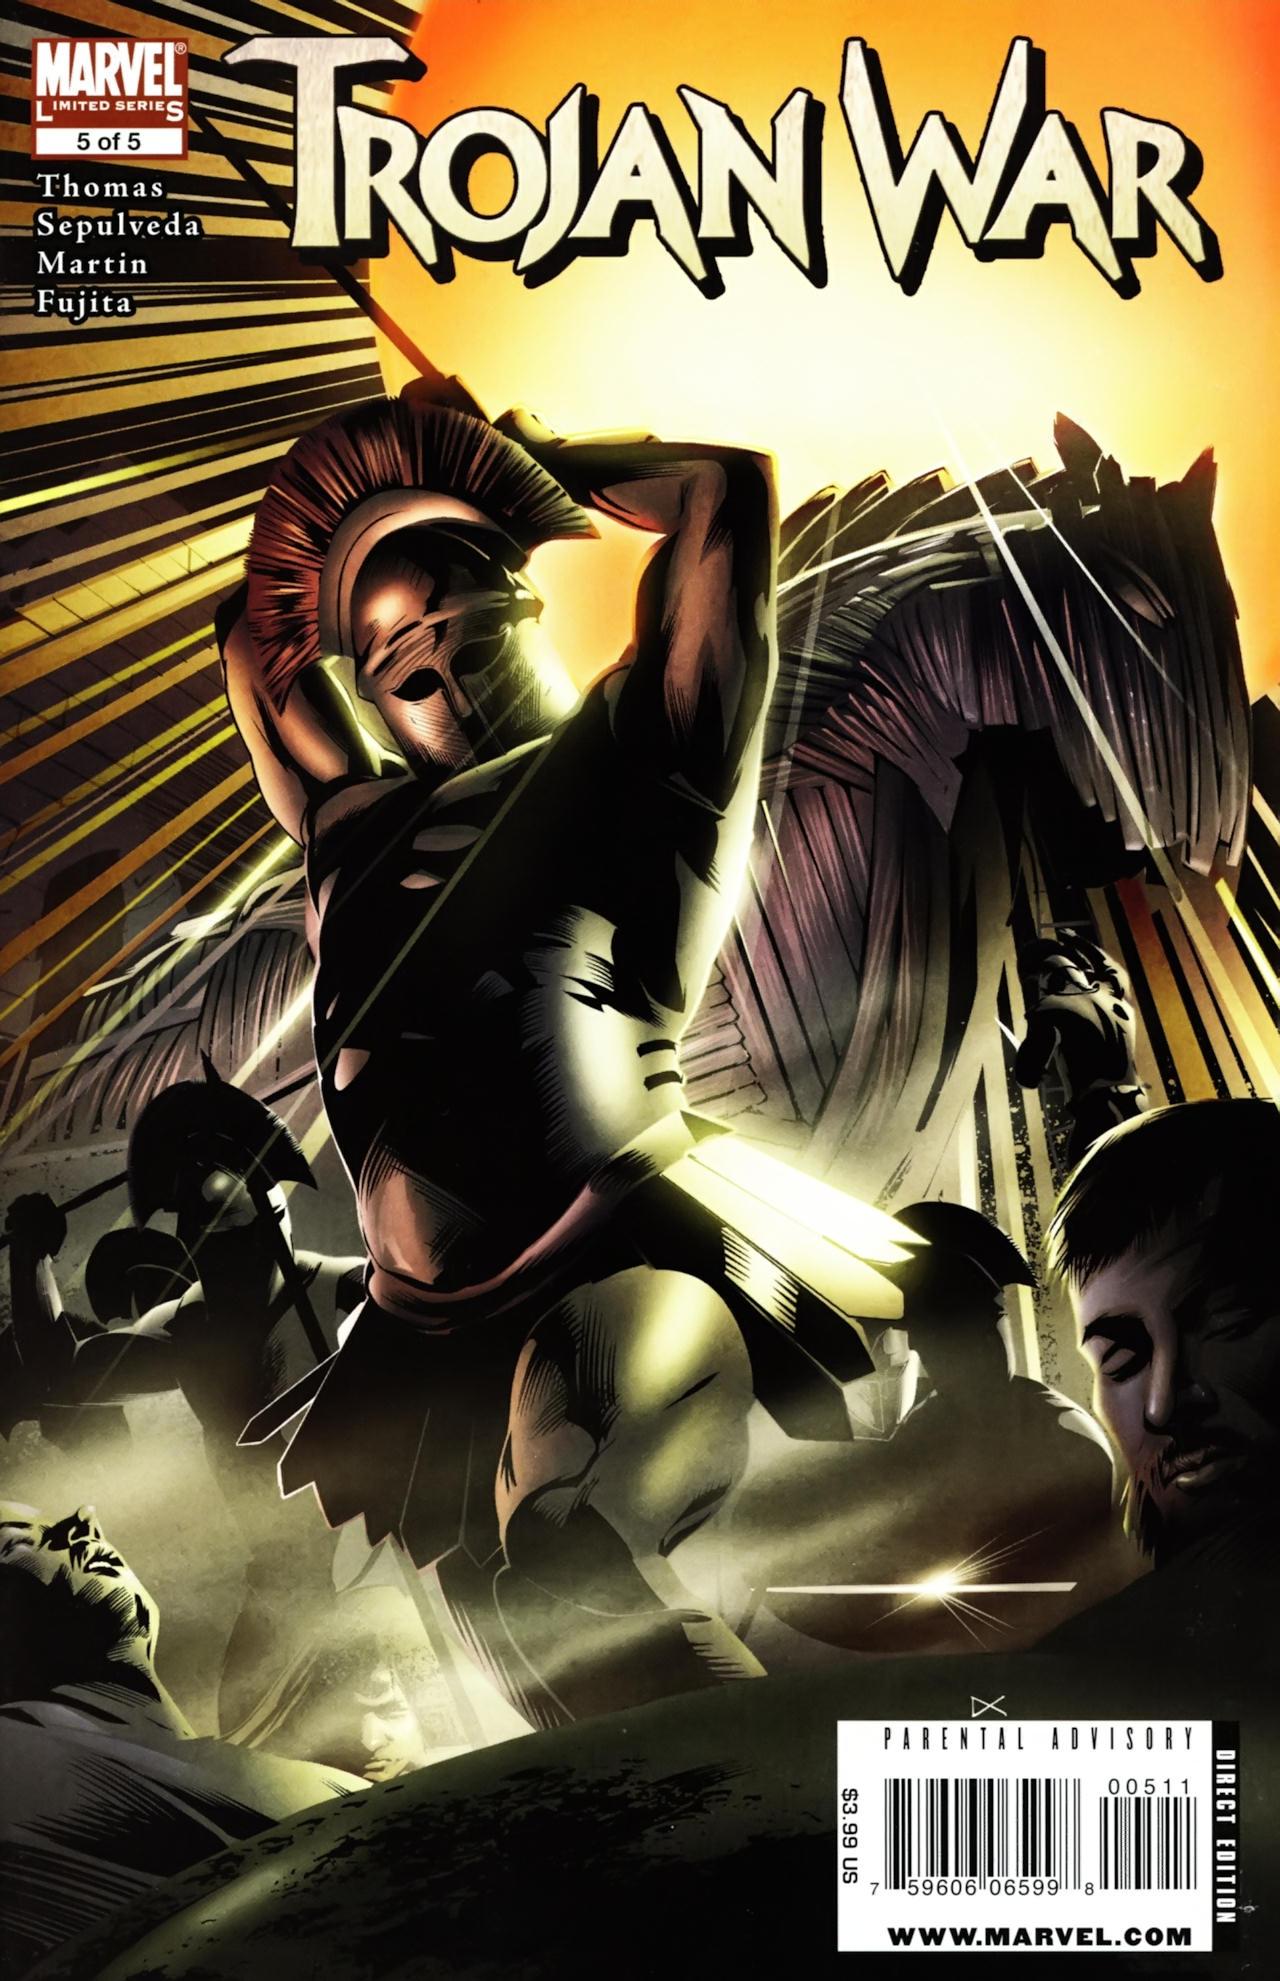 Read online Trojan War comic -  Issue #5 - 1